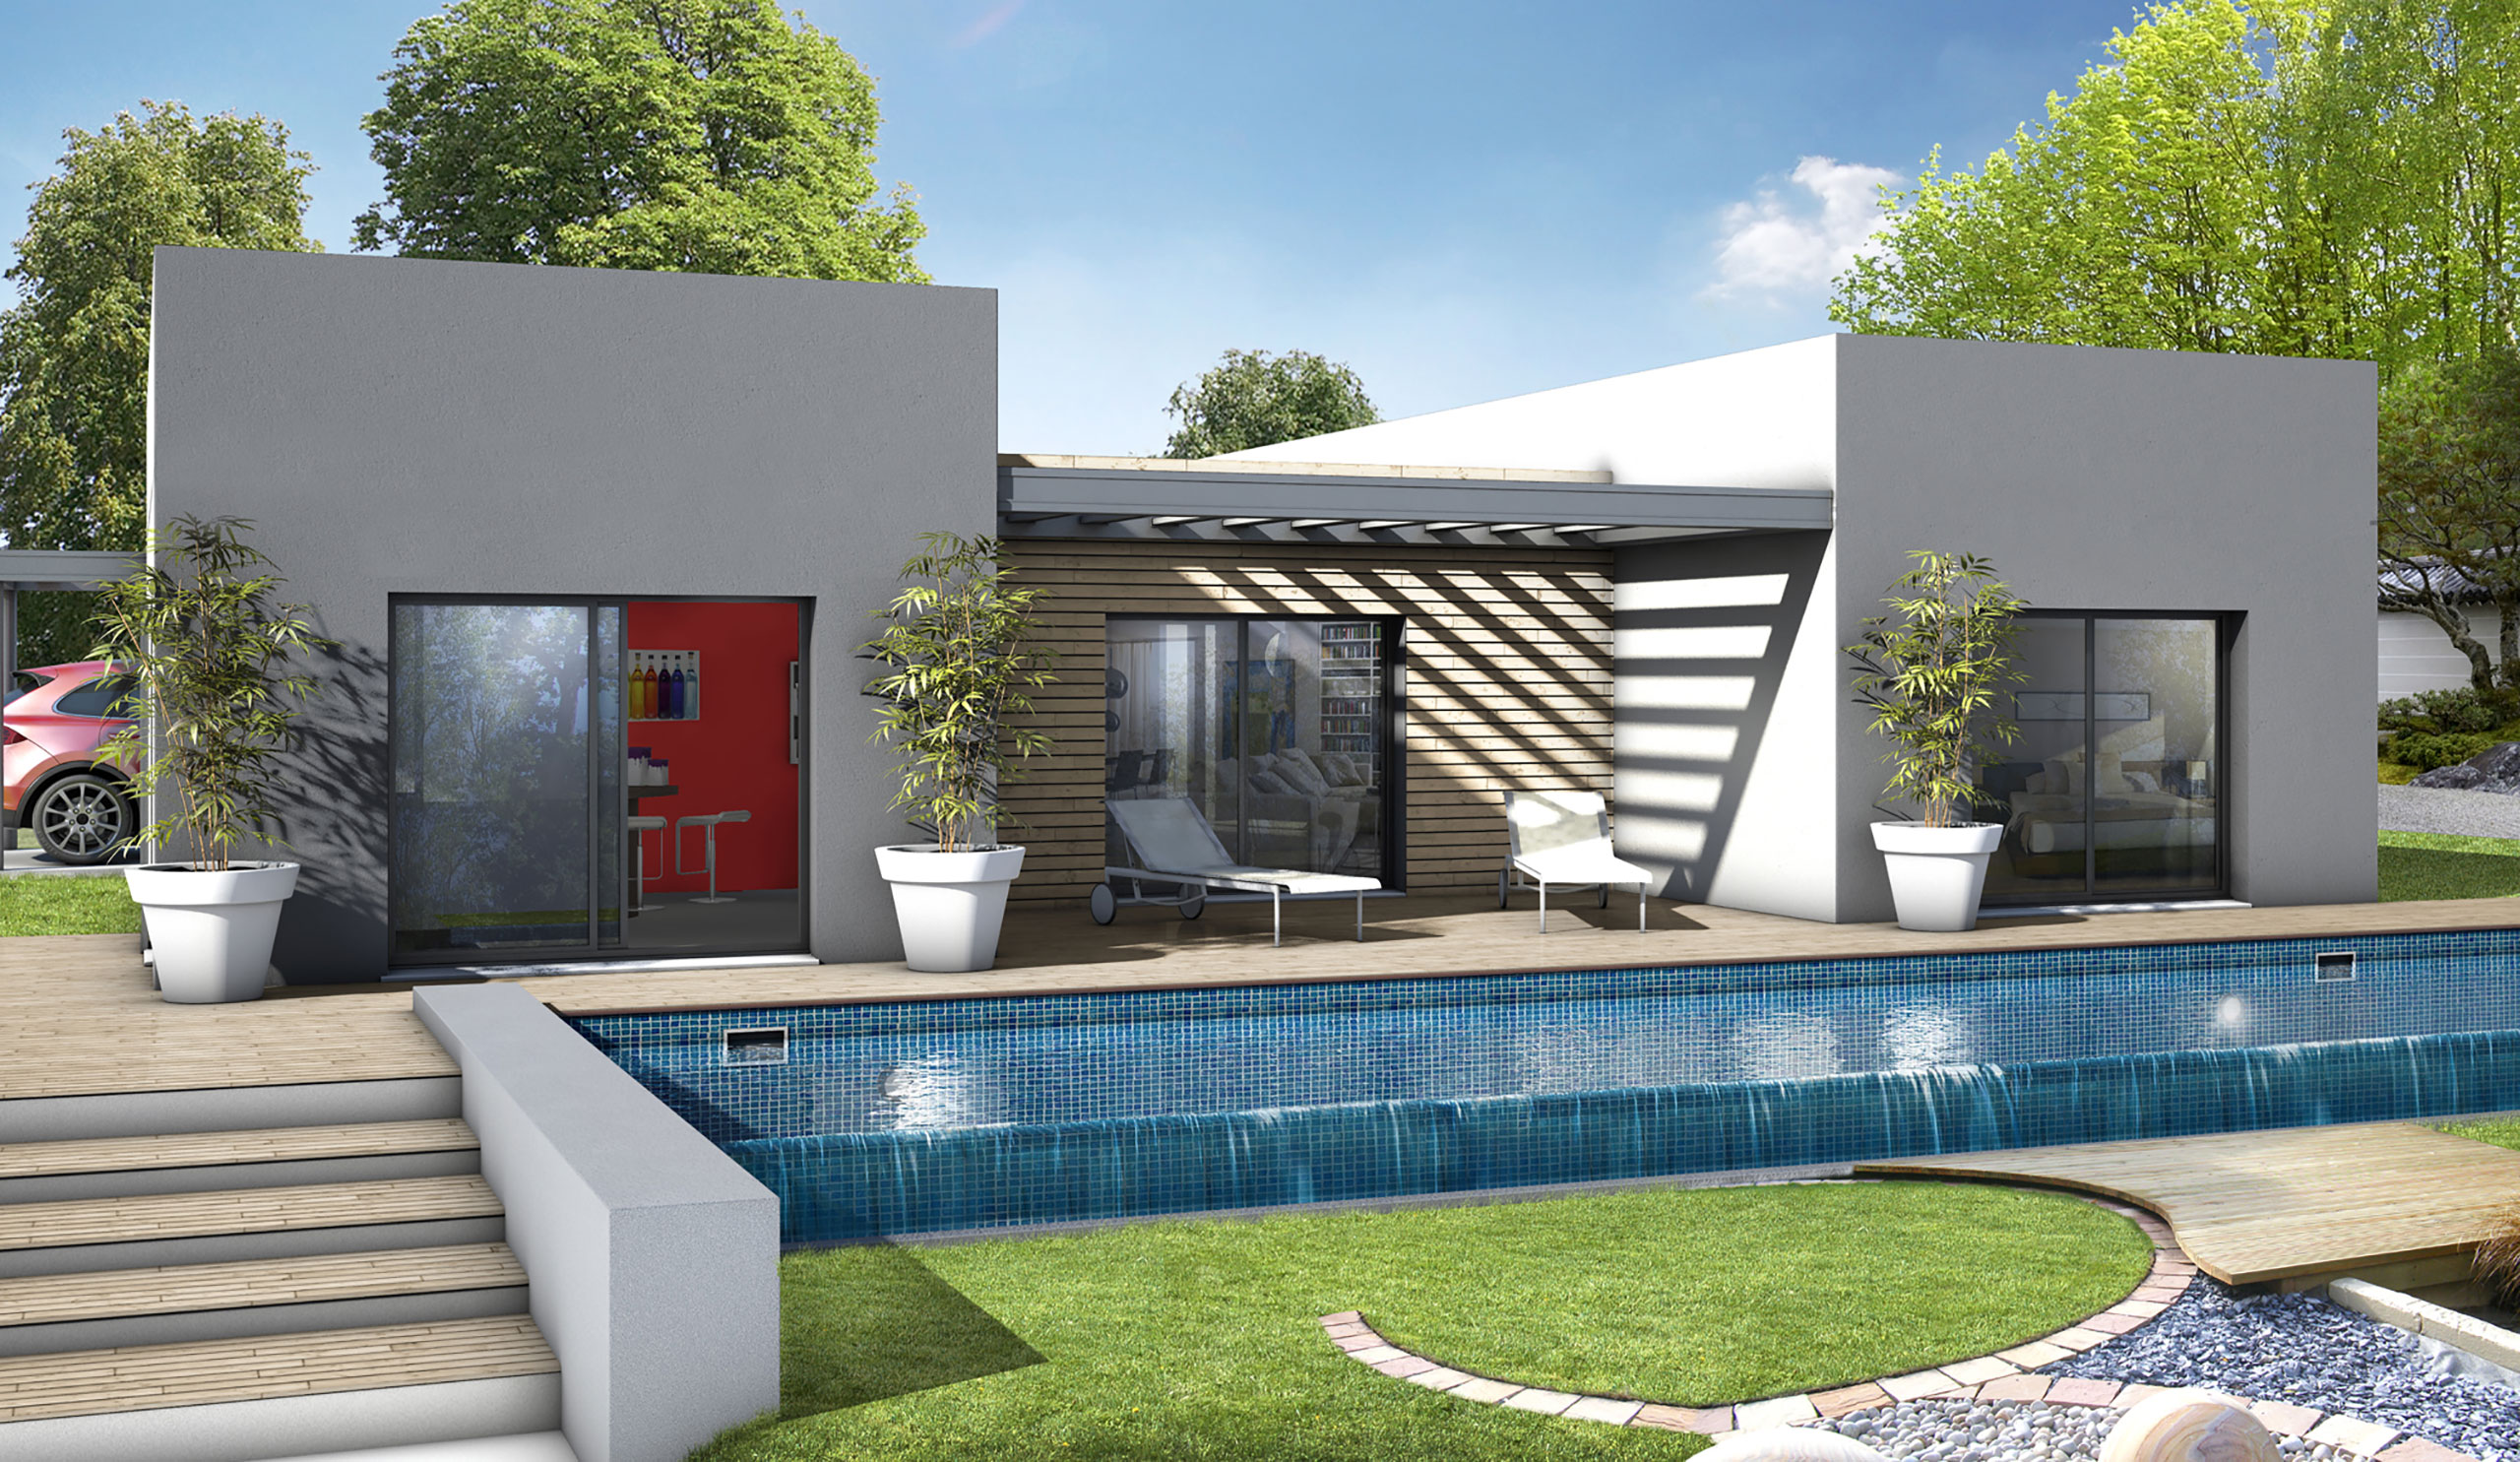 Maison Moderne Terrasse Couverte